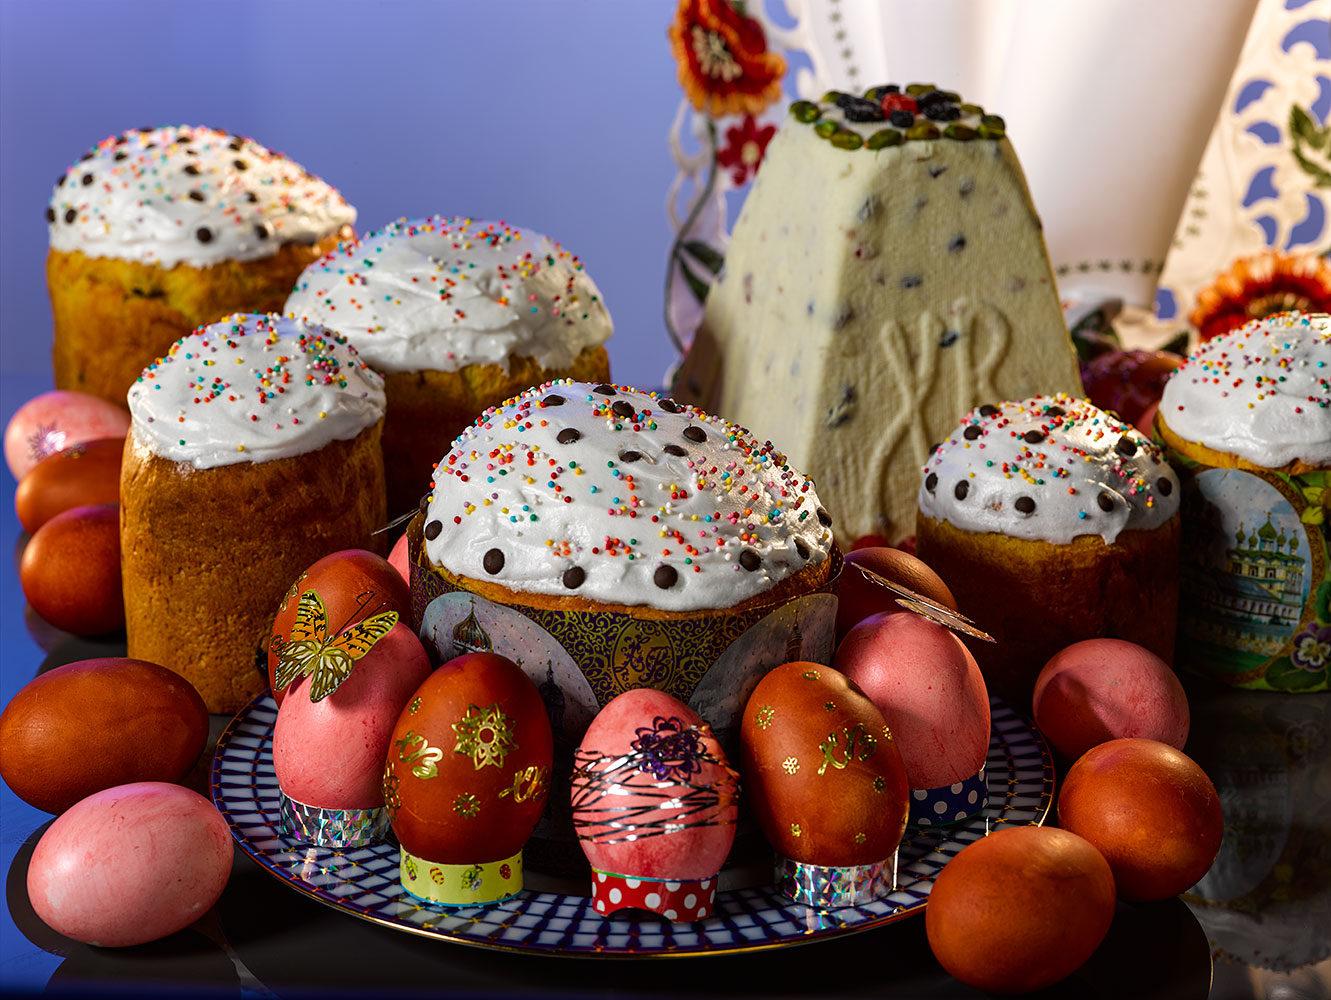 http://lyalovo.ru/wp-content/uploads/2017/04/Cakes-eggs.jpg